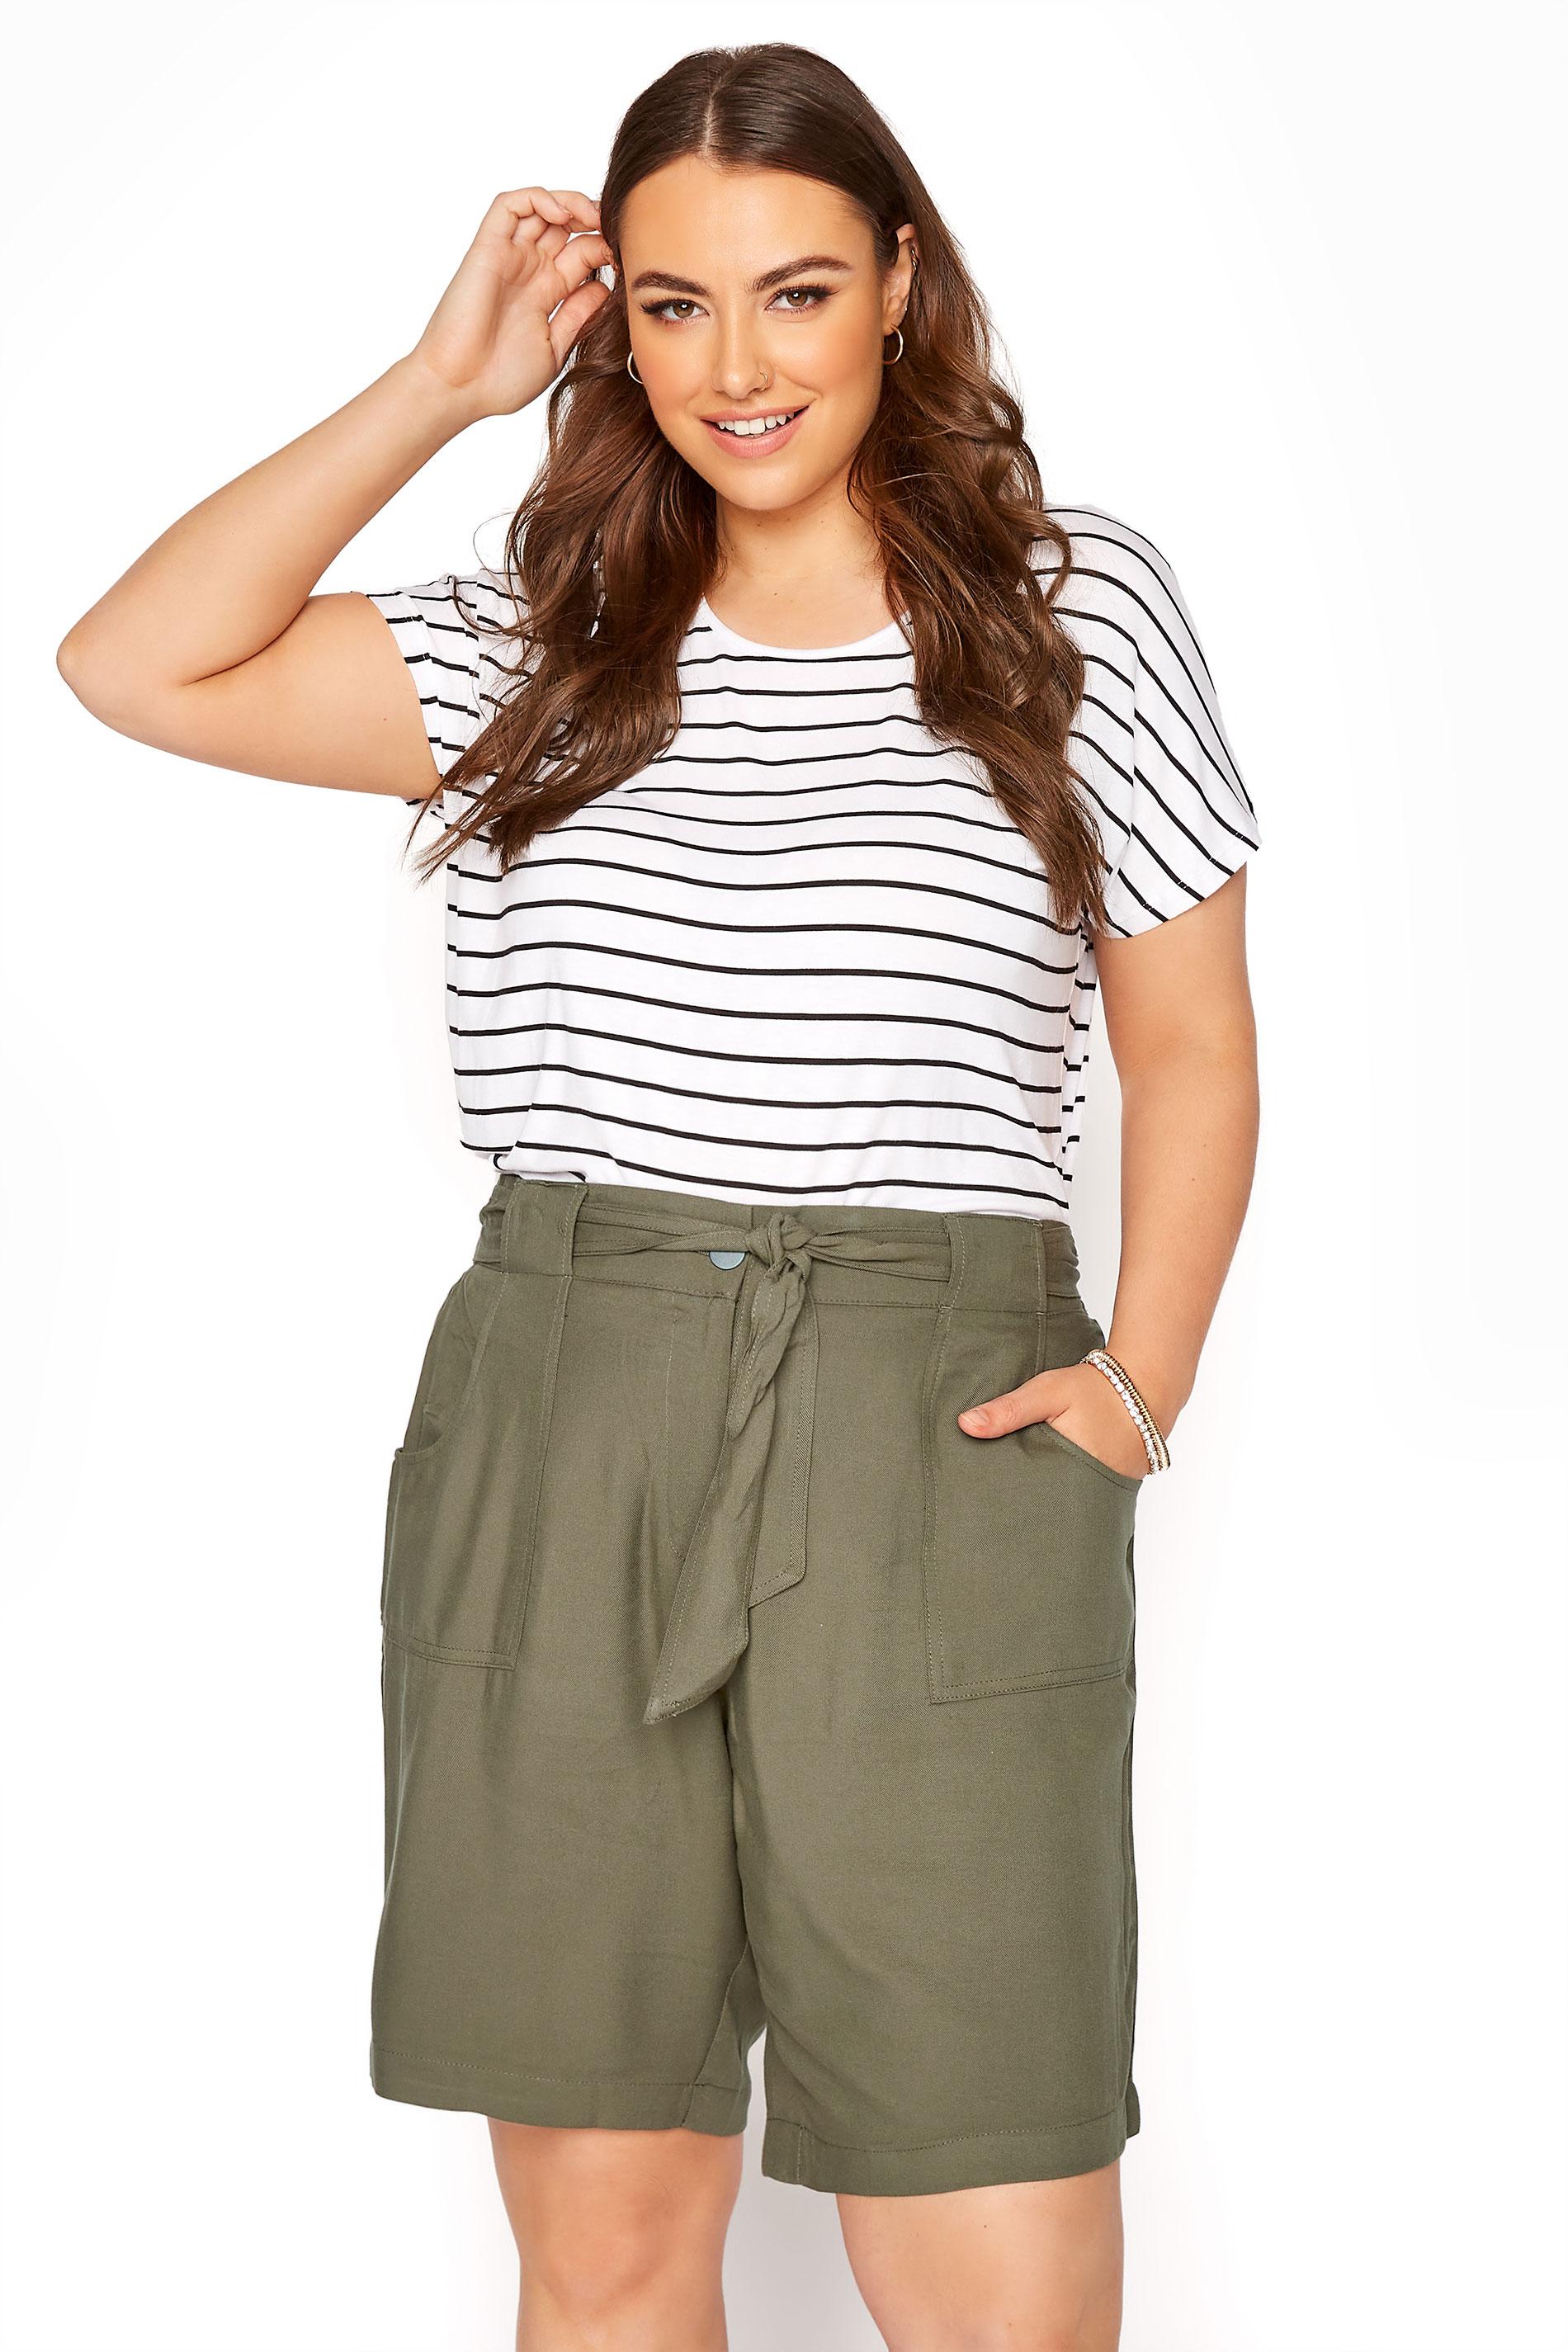 Khaki Belted Shorts_A.jpg